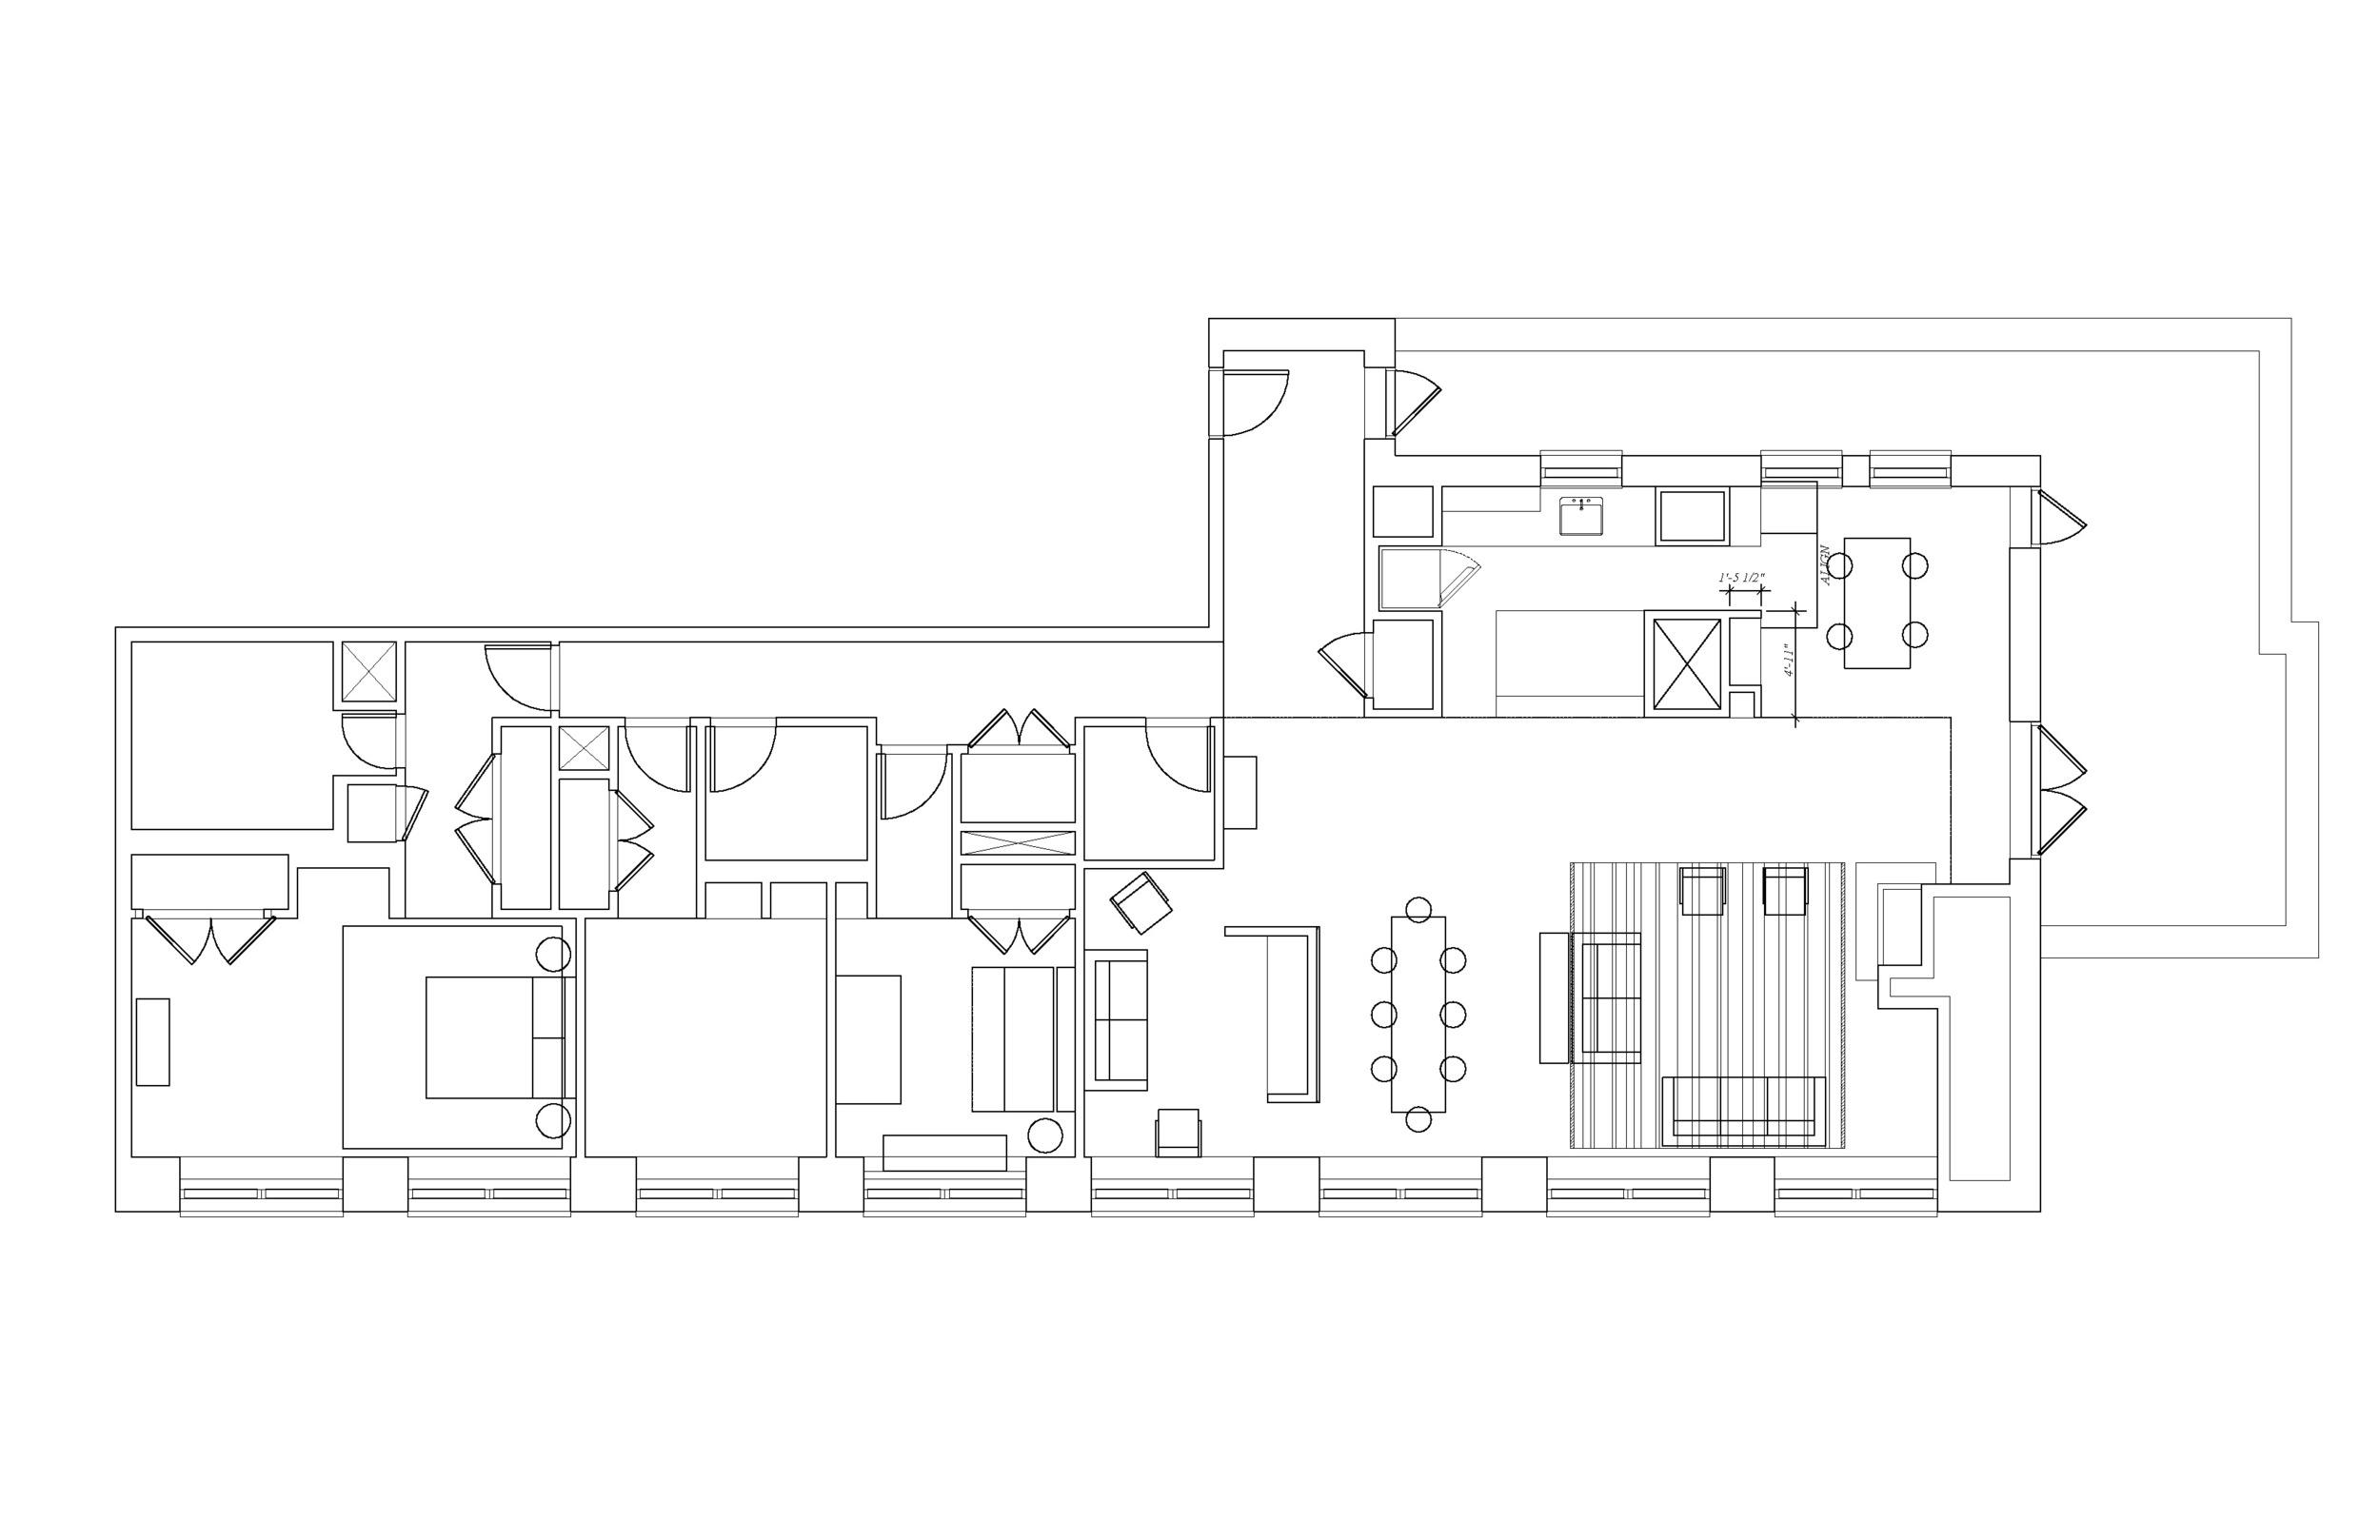 01_124 HudsonStreet PENTHOUSE UNIT PLAN.jpg